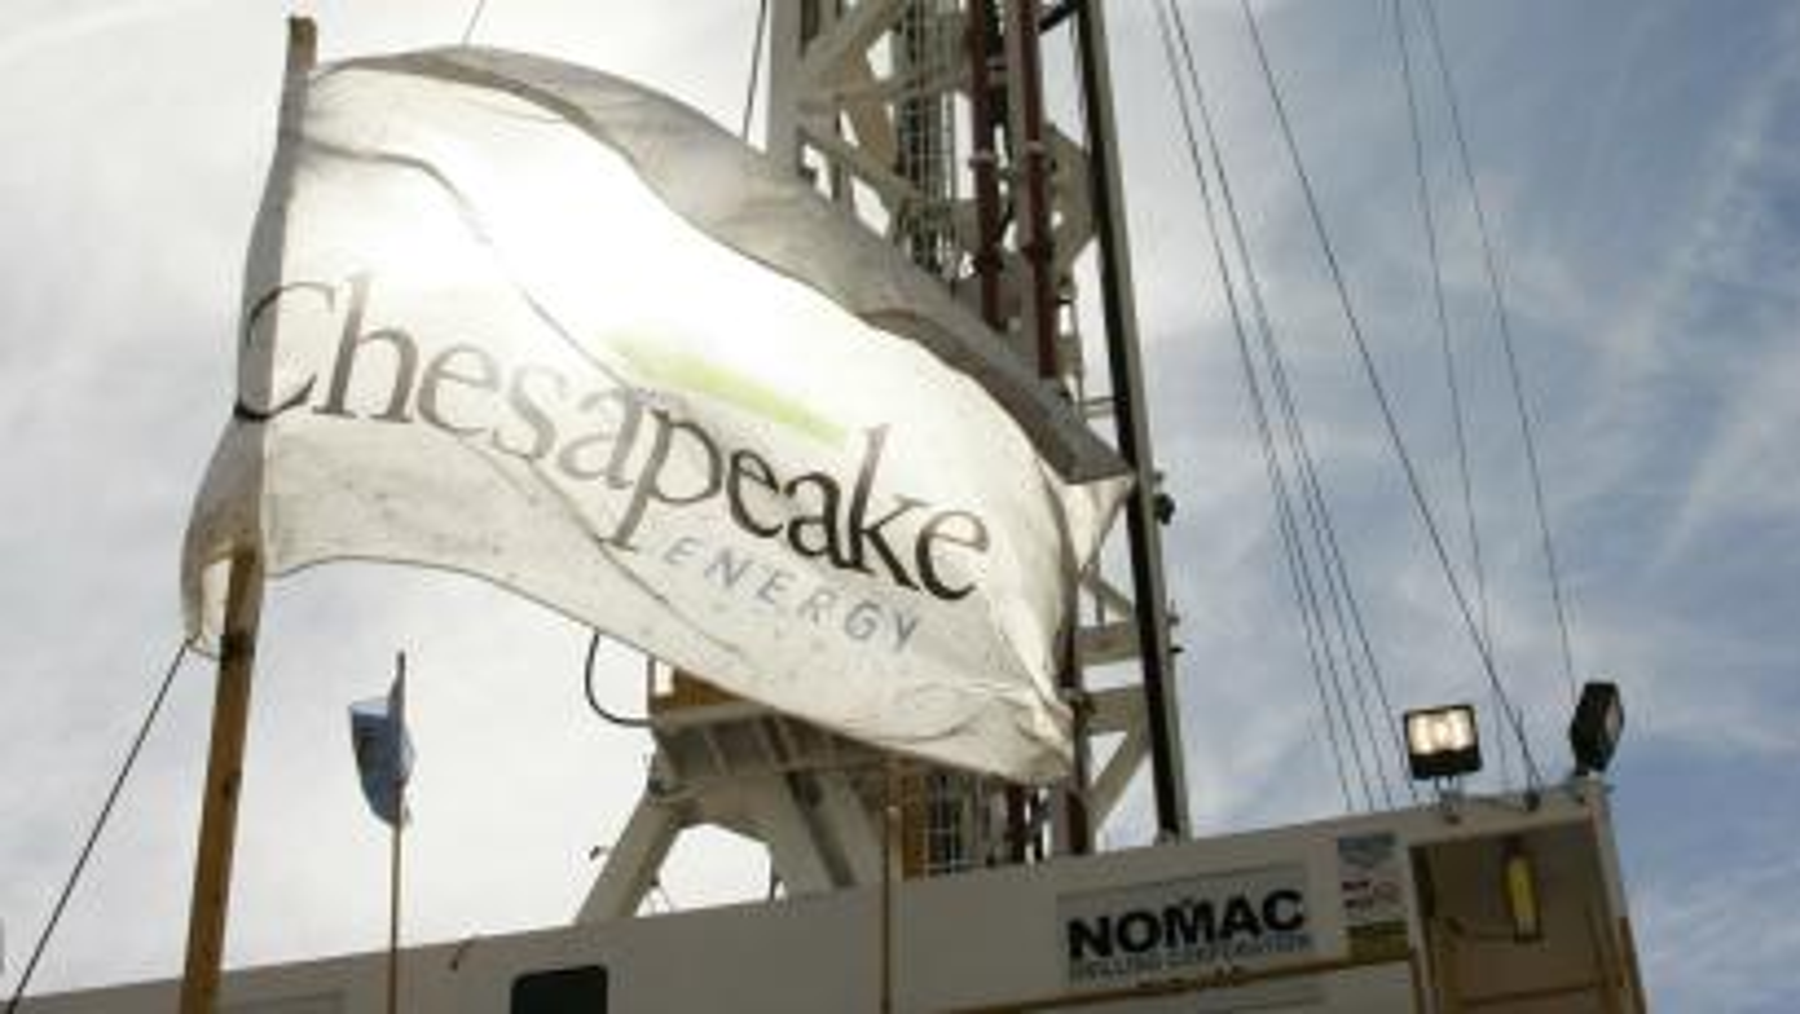 A Chesapeake drilling rig near Bessie, Oklahoma.